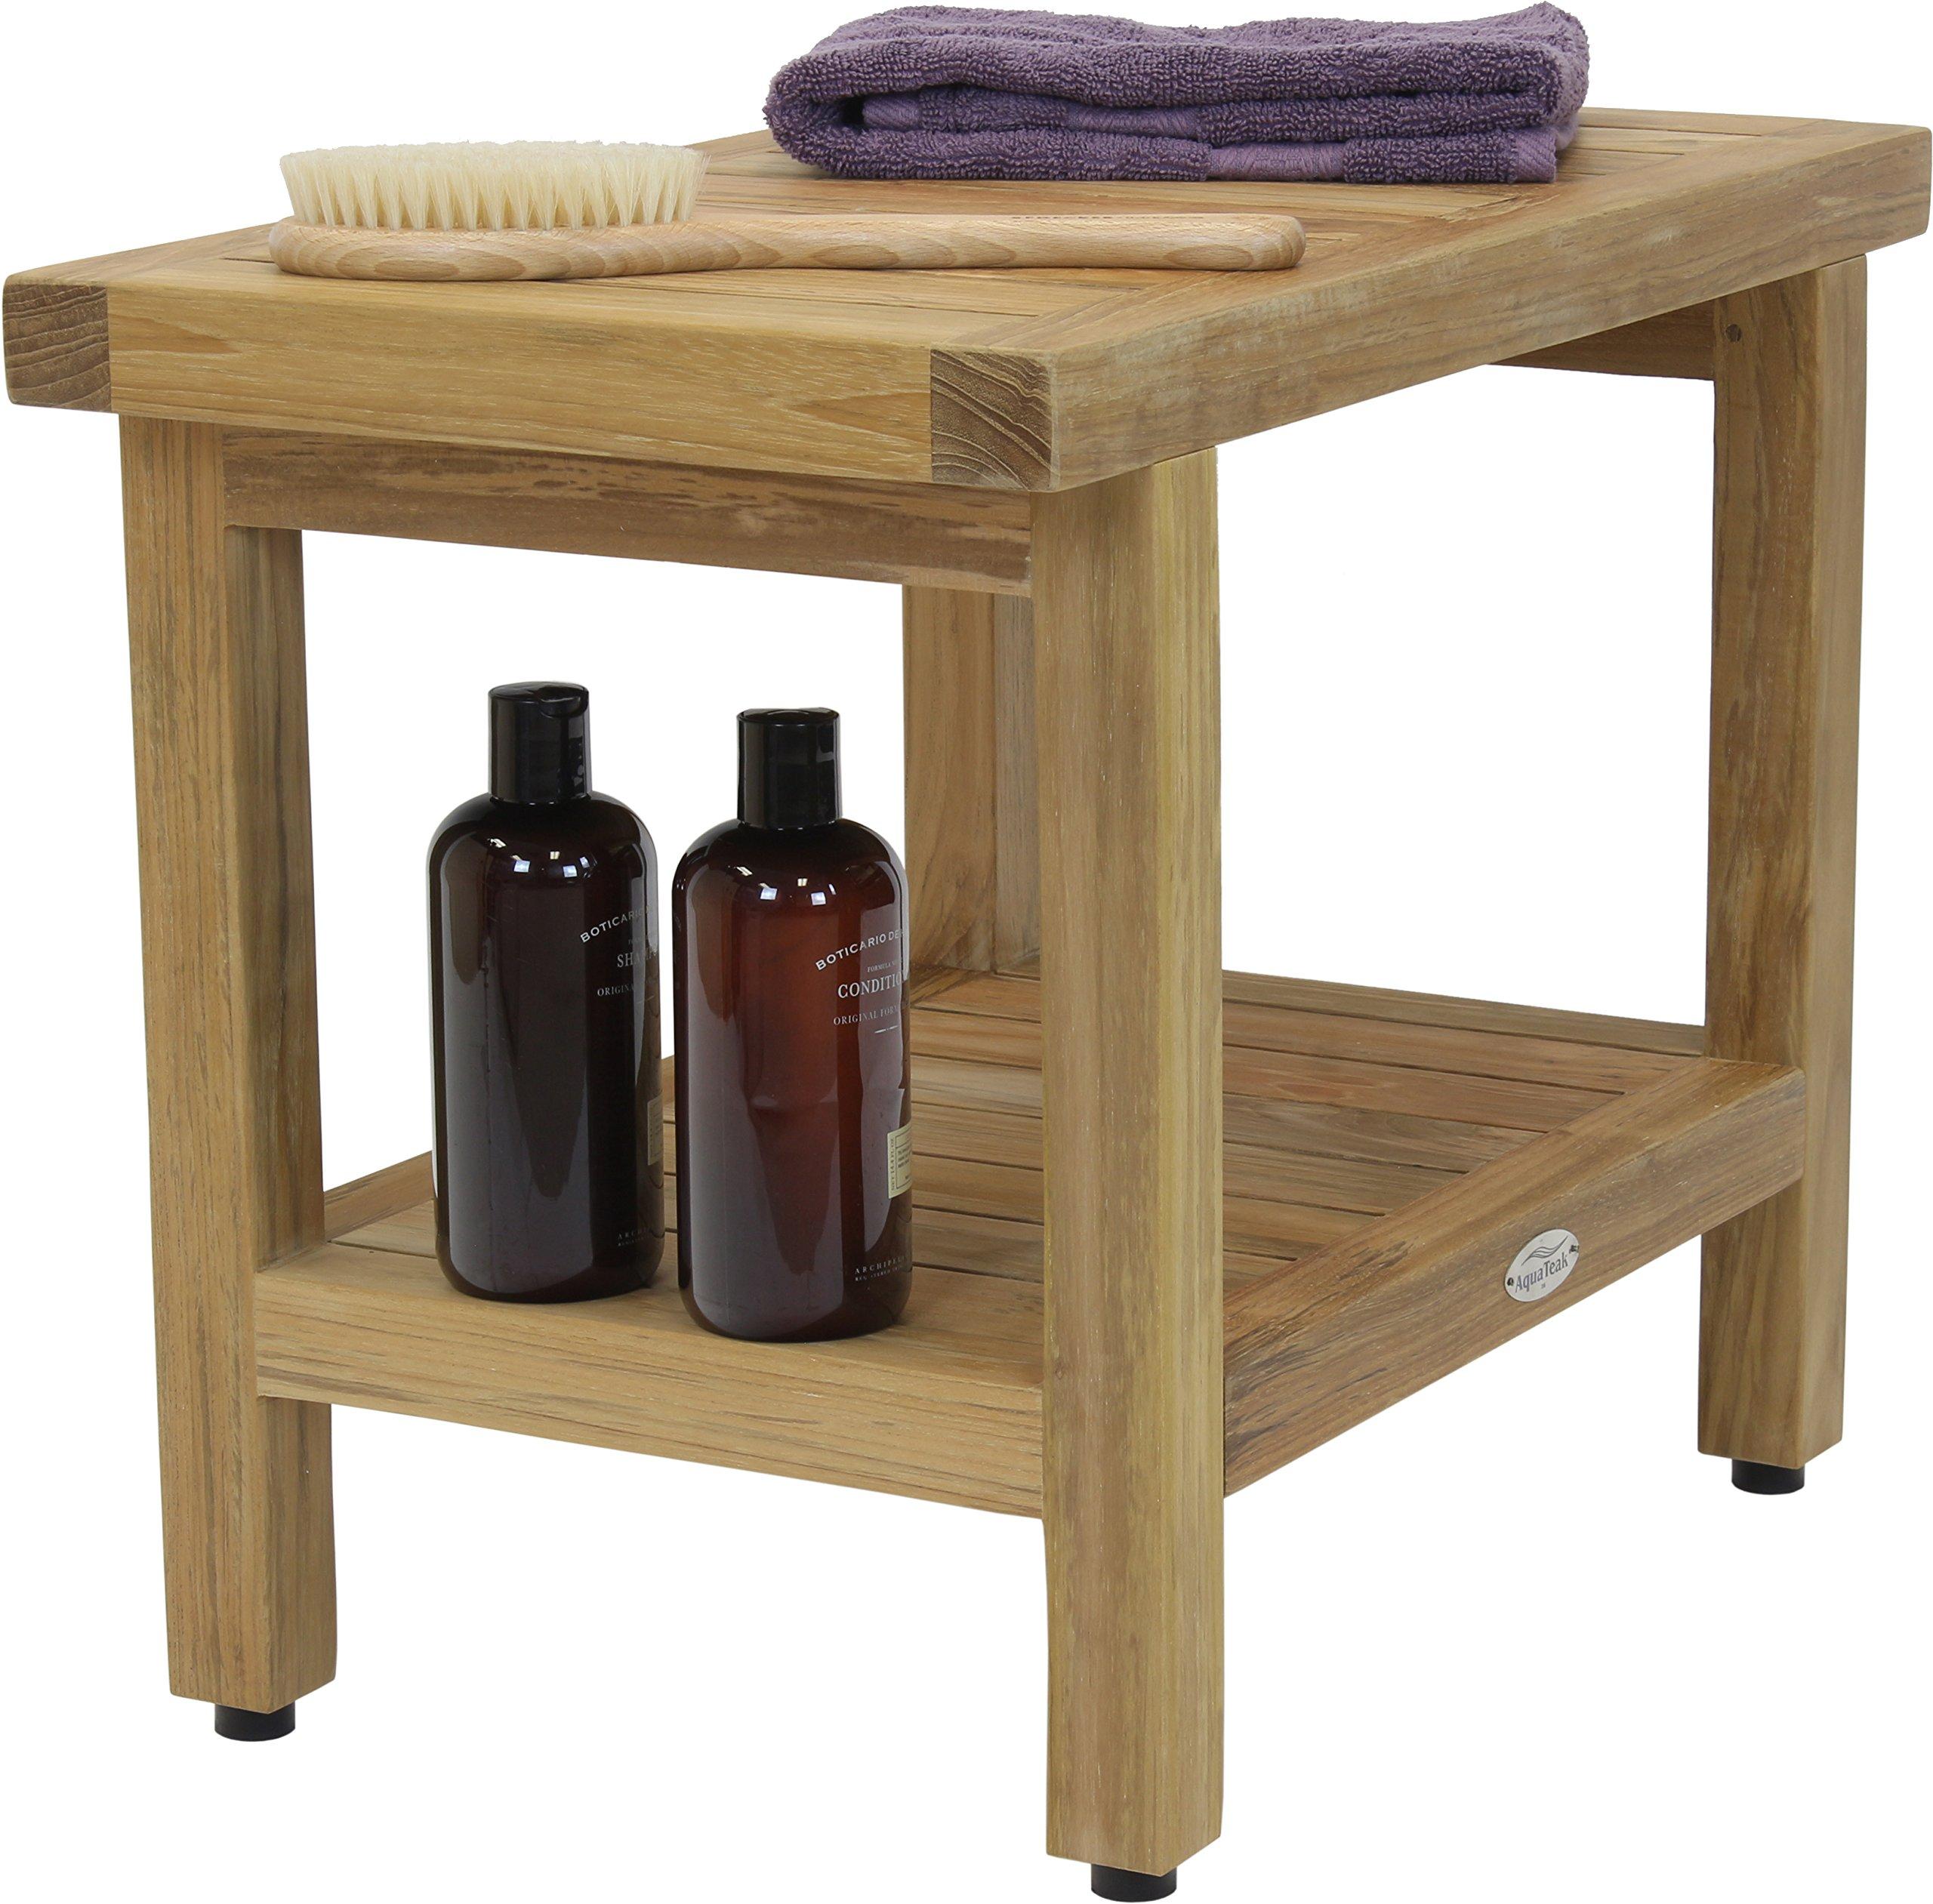 24'' Spa Natural Teak Shower Bench with Shelf by AquaTeak (Image #1)